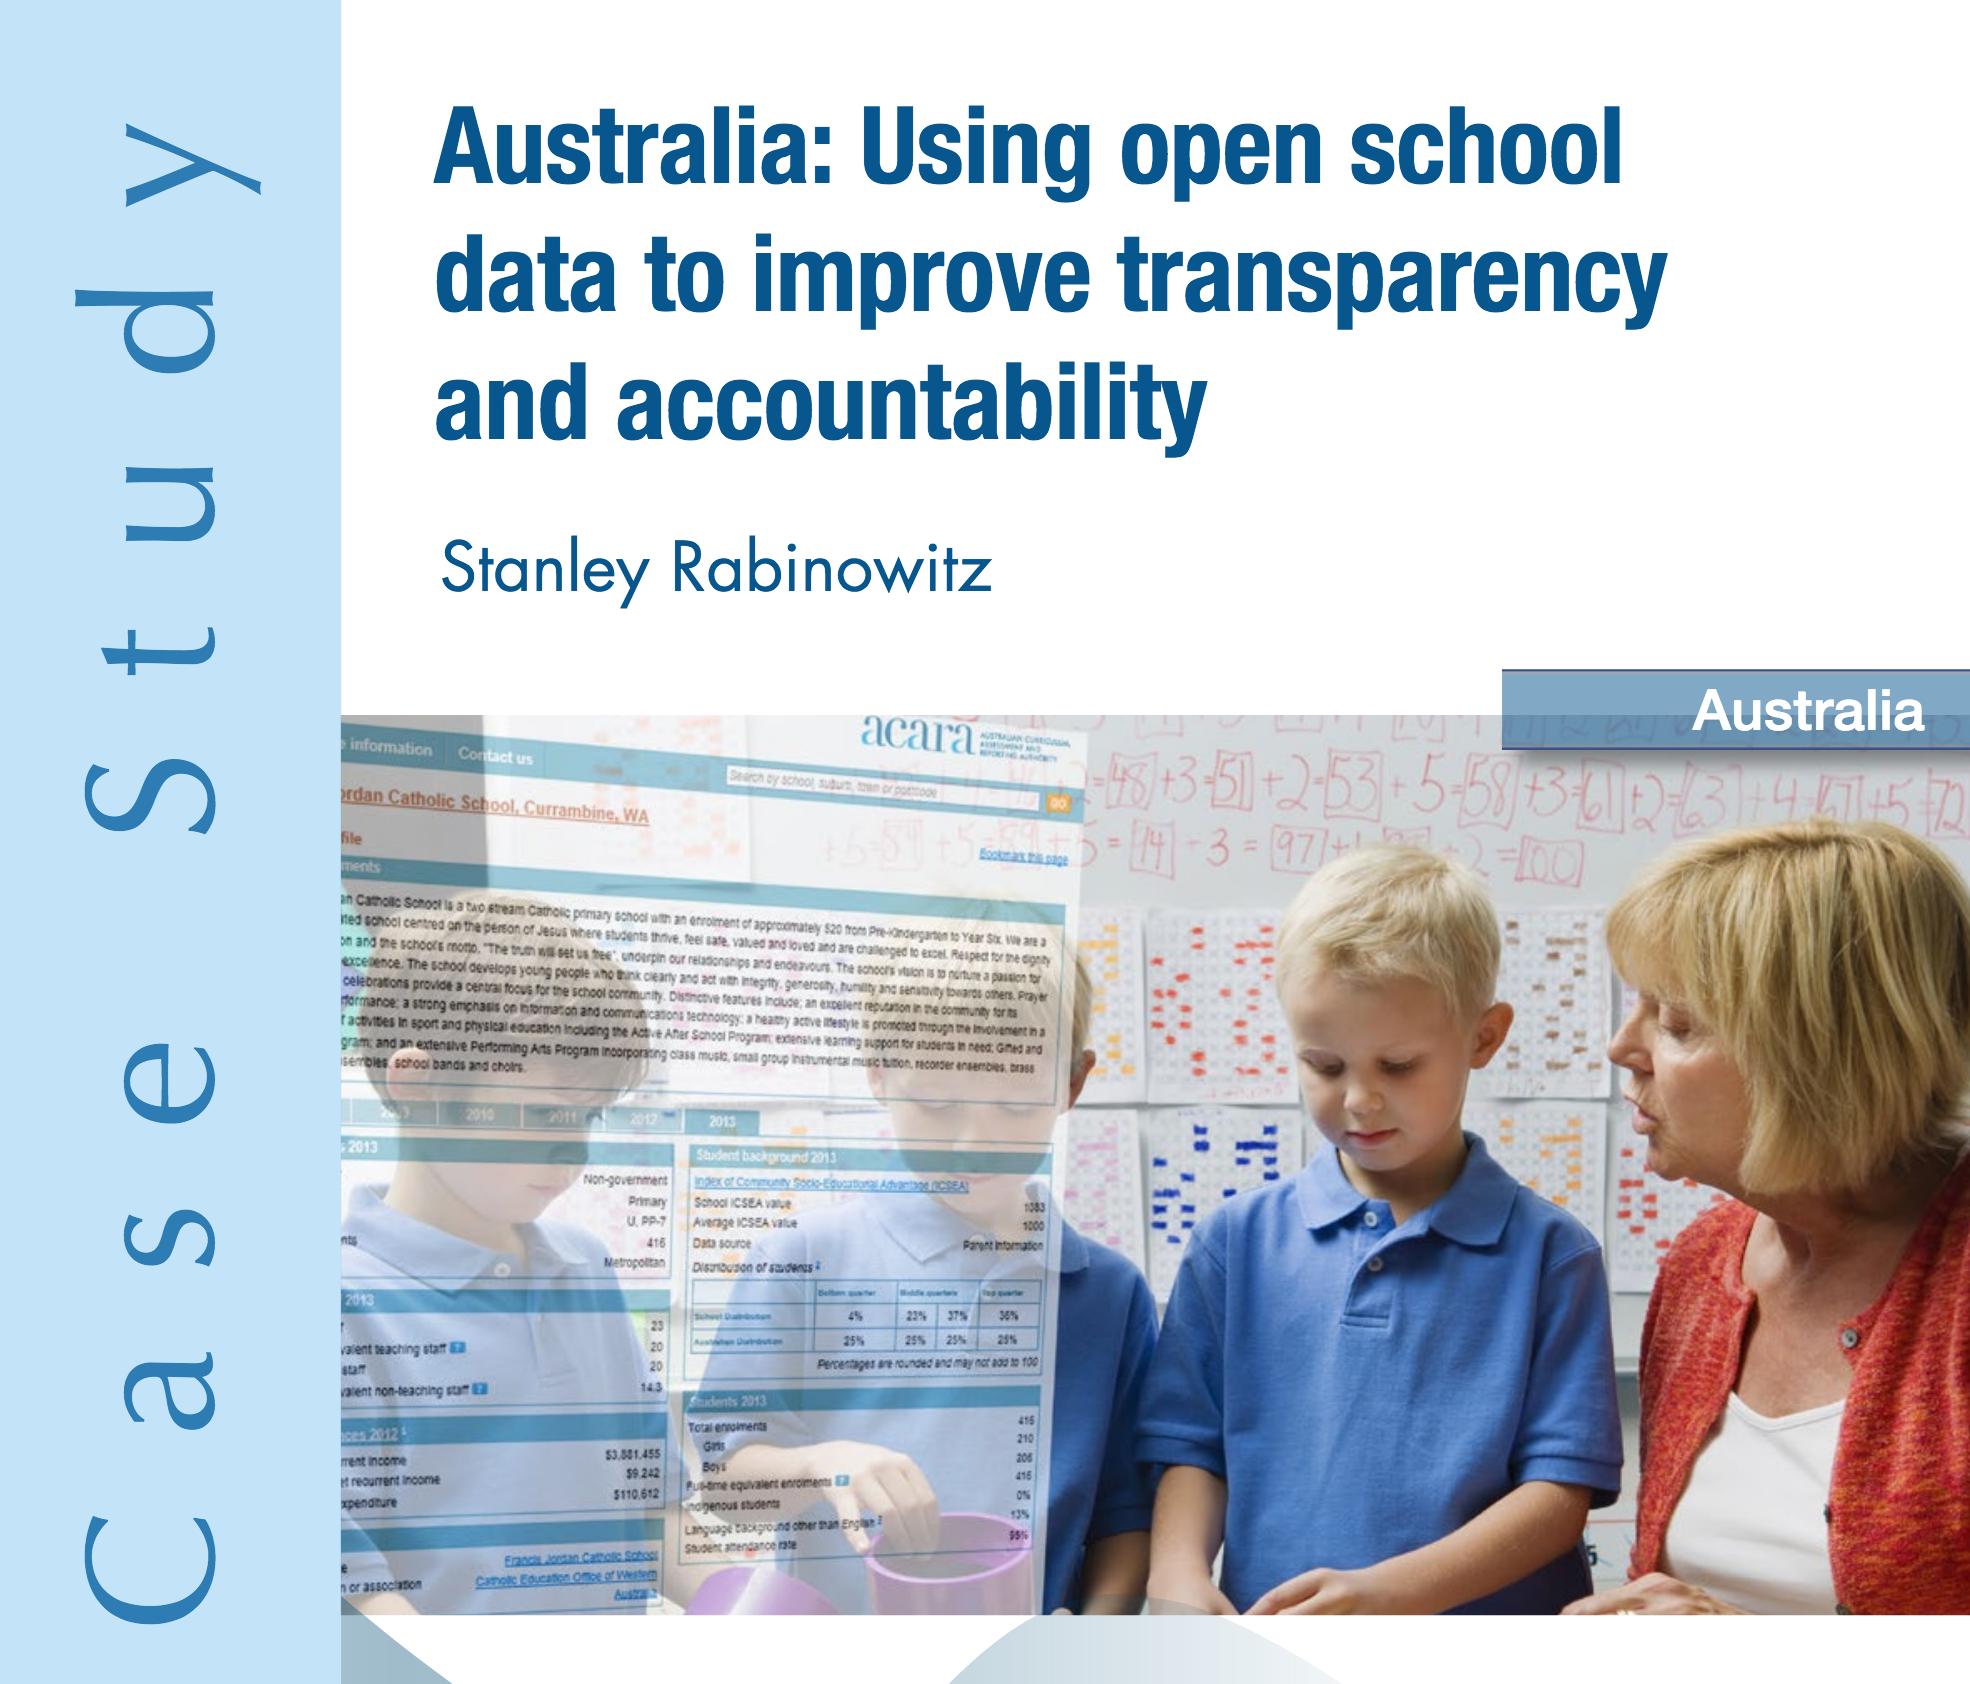 Case Study Snackbrands Australia: Promoting Accountability Through Open School Data